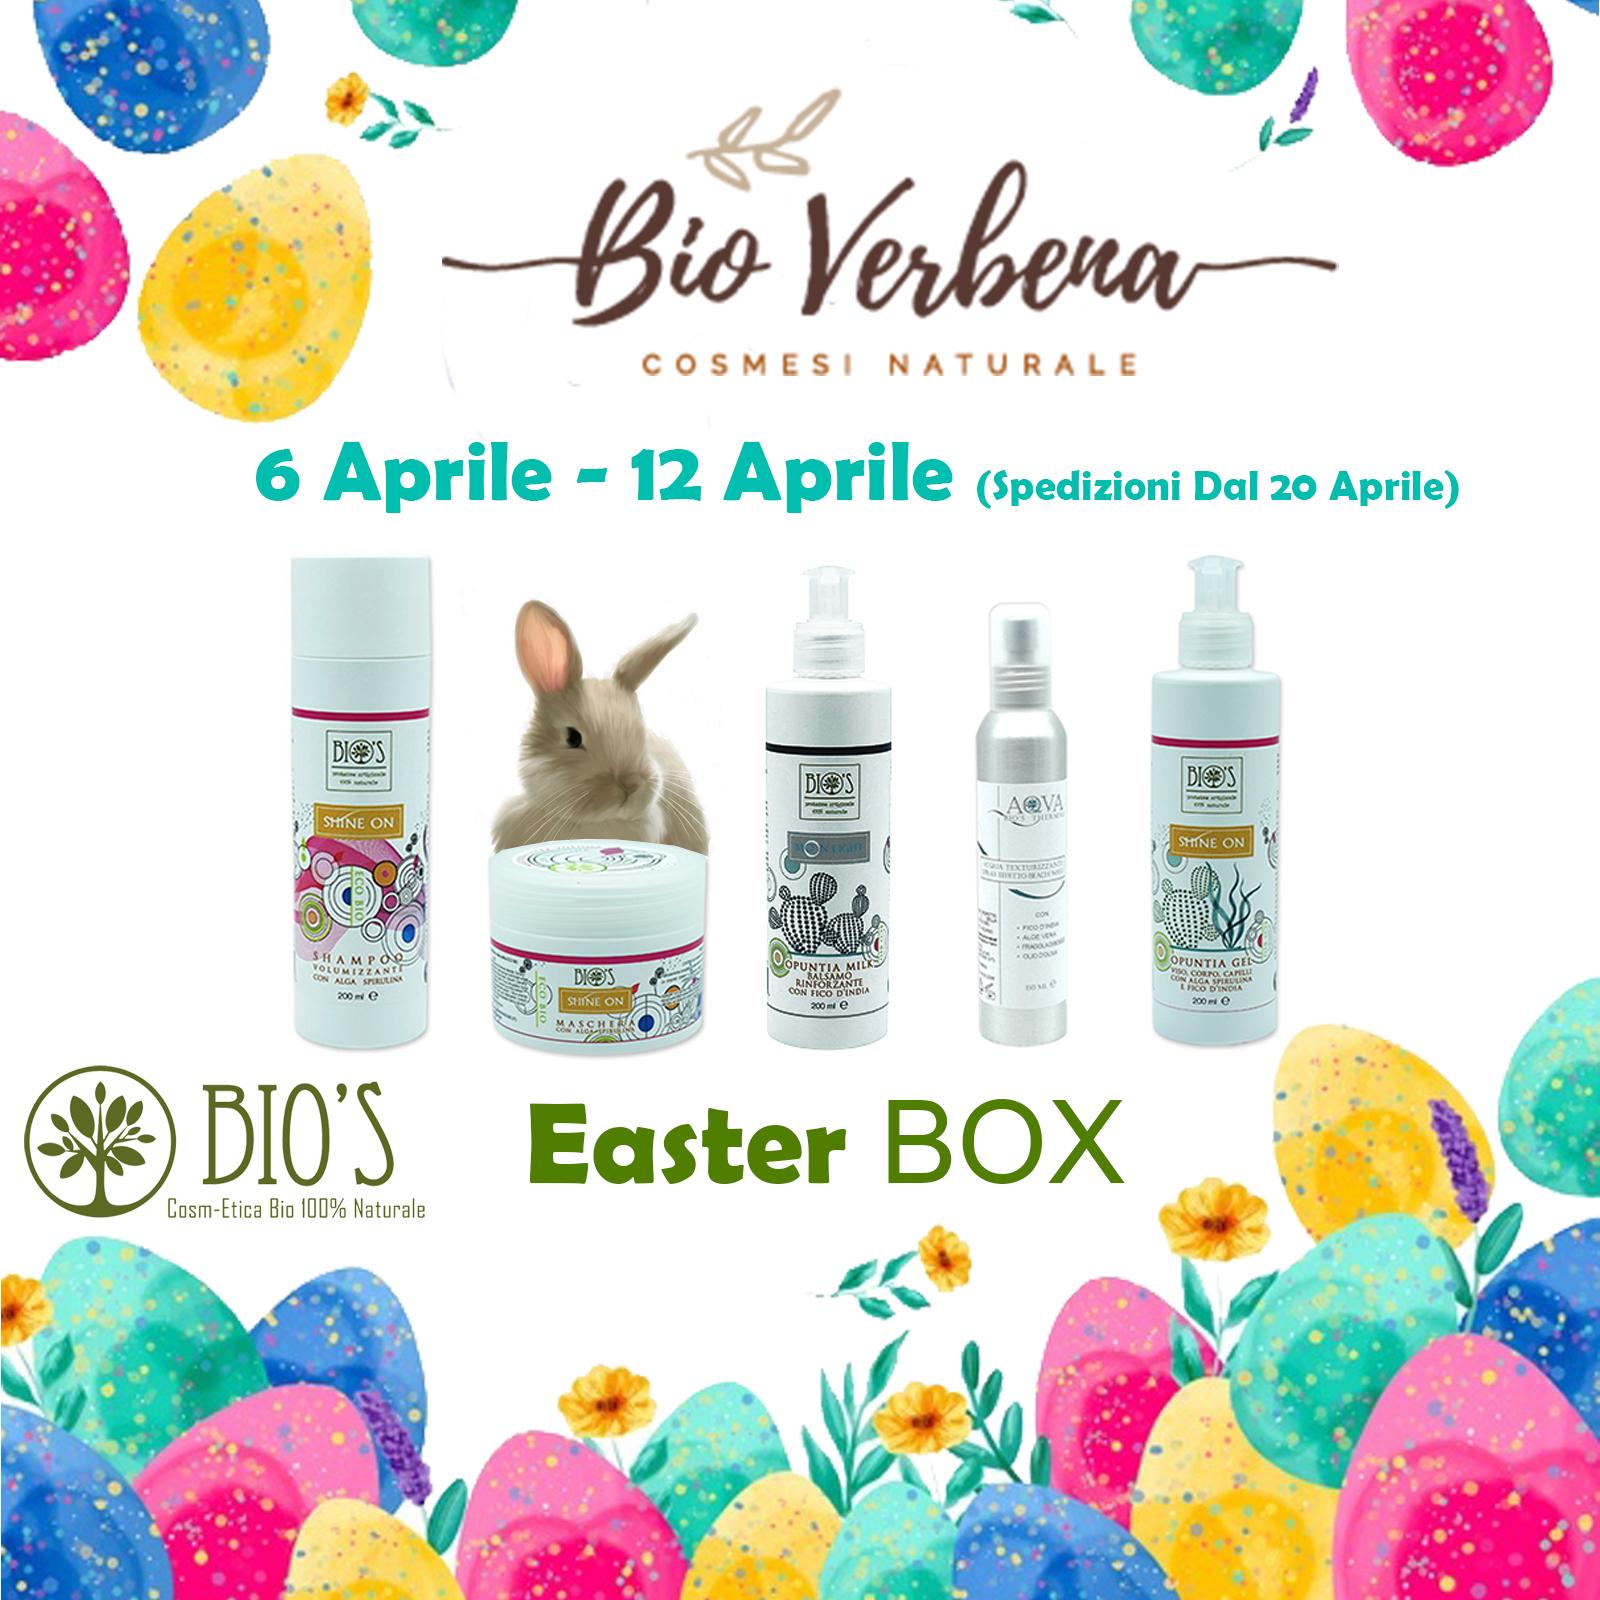 Easter BOX Bioverbena e Bio's